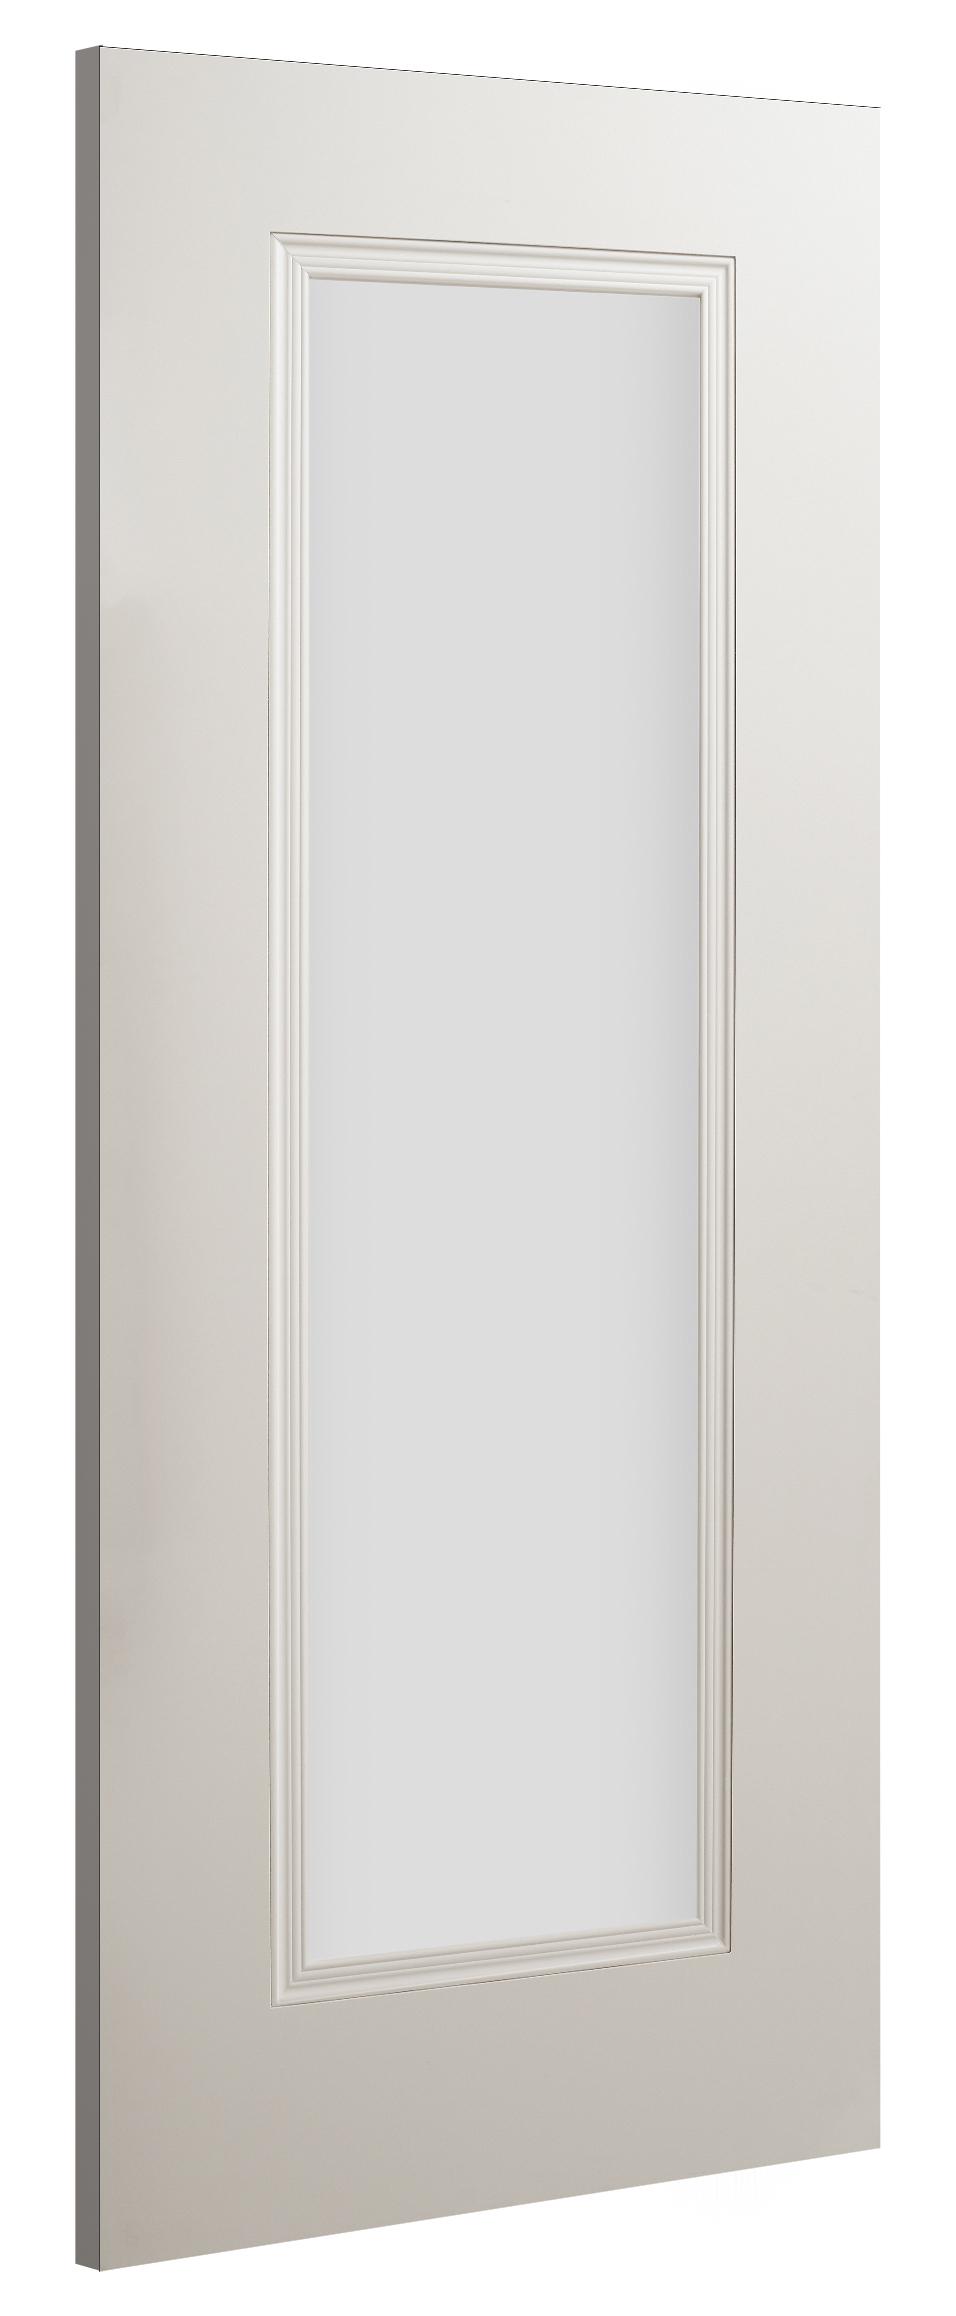 Primed Doors HP37G-F